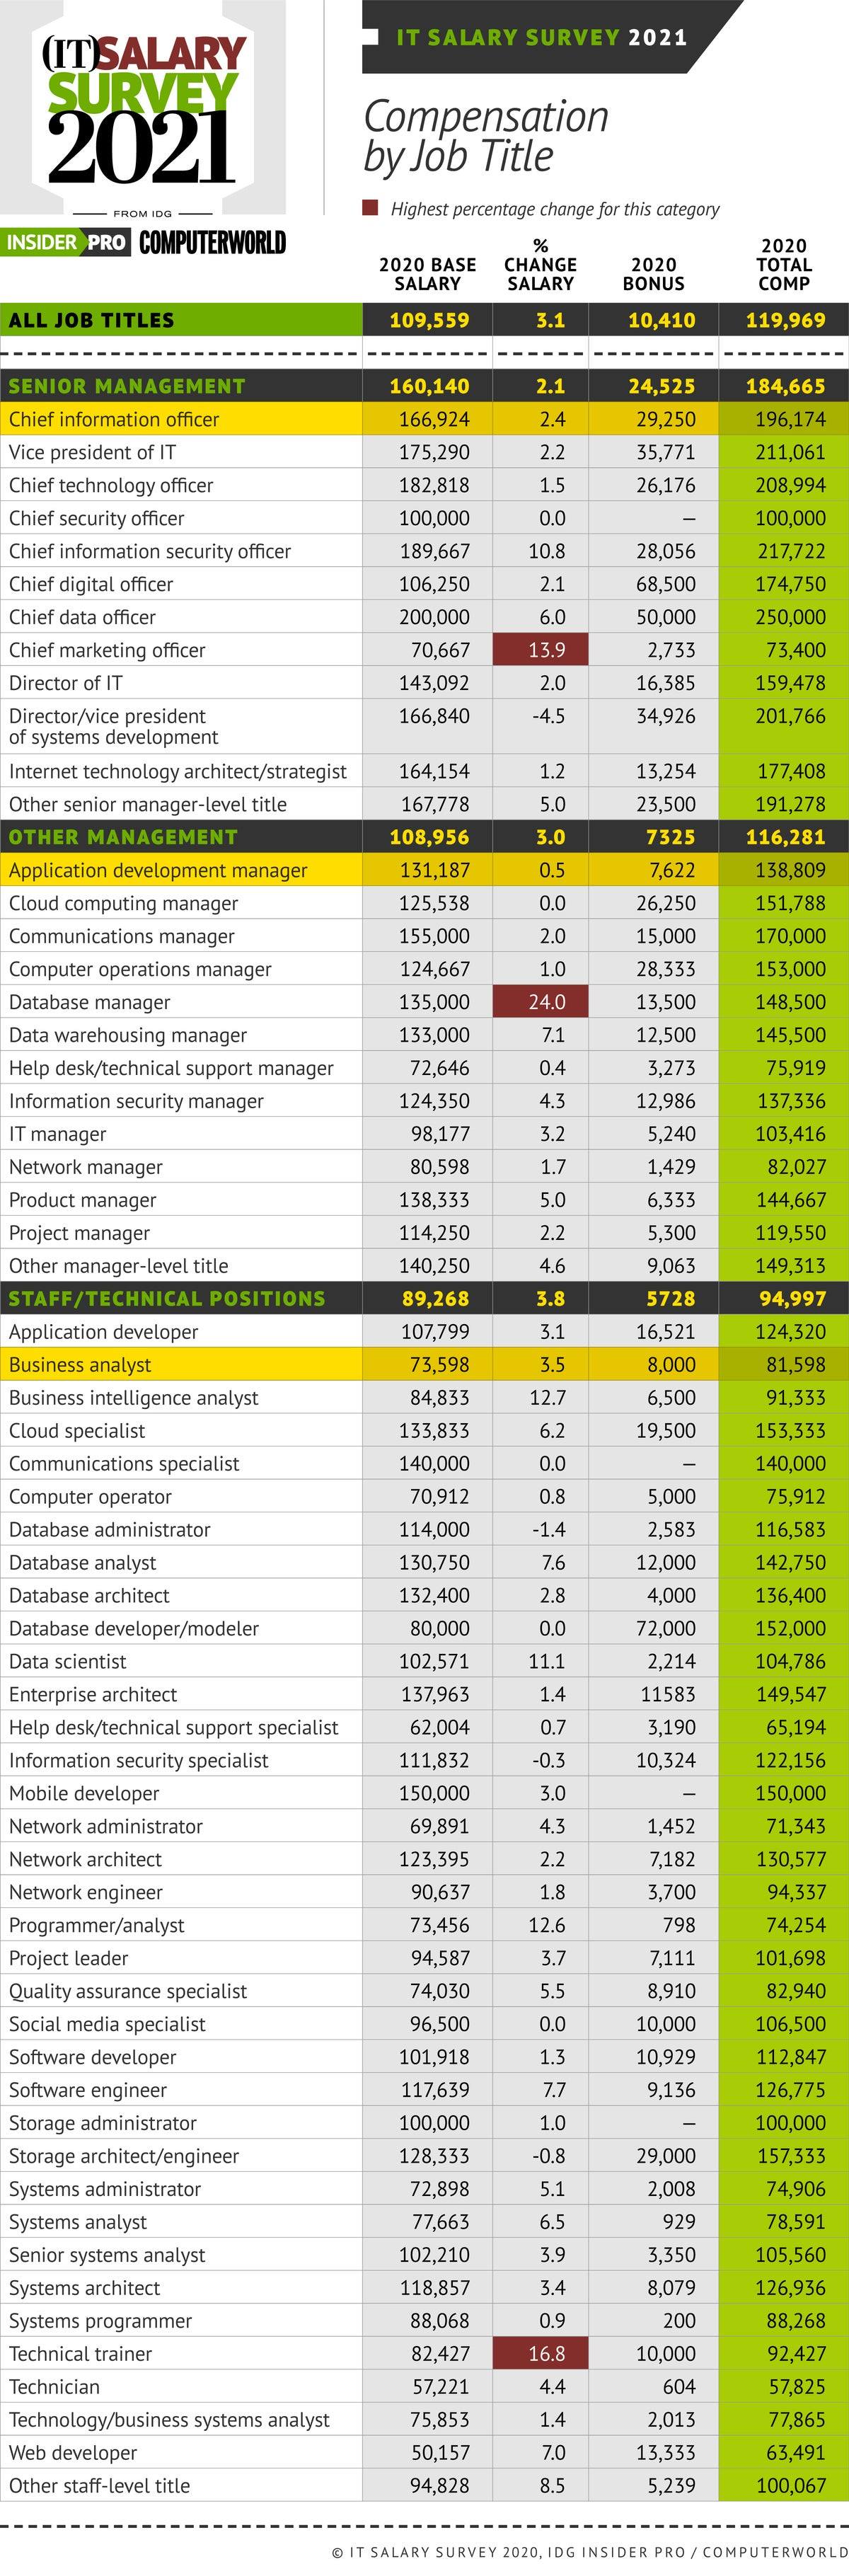 Insider Pro   Computerworld  >  IT Salary Survey 2021  >  Compensation by Job Title